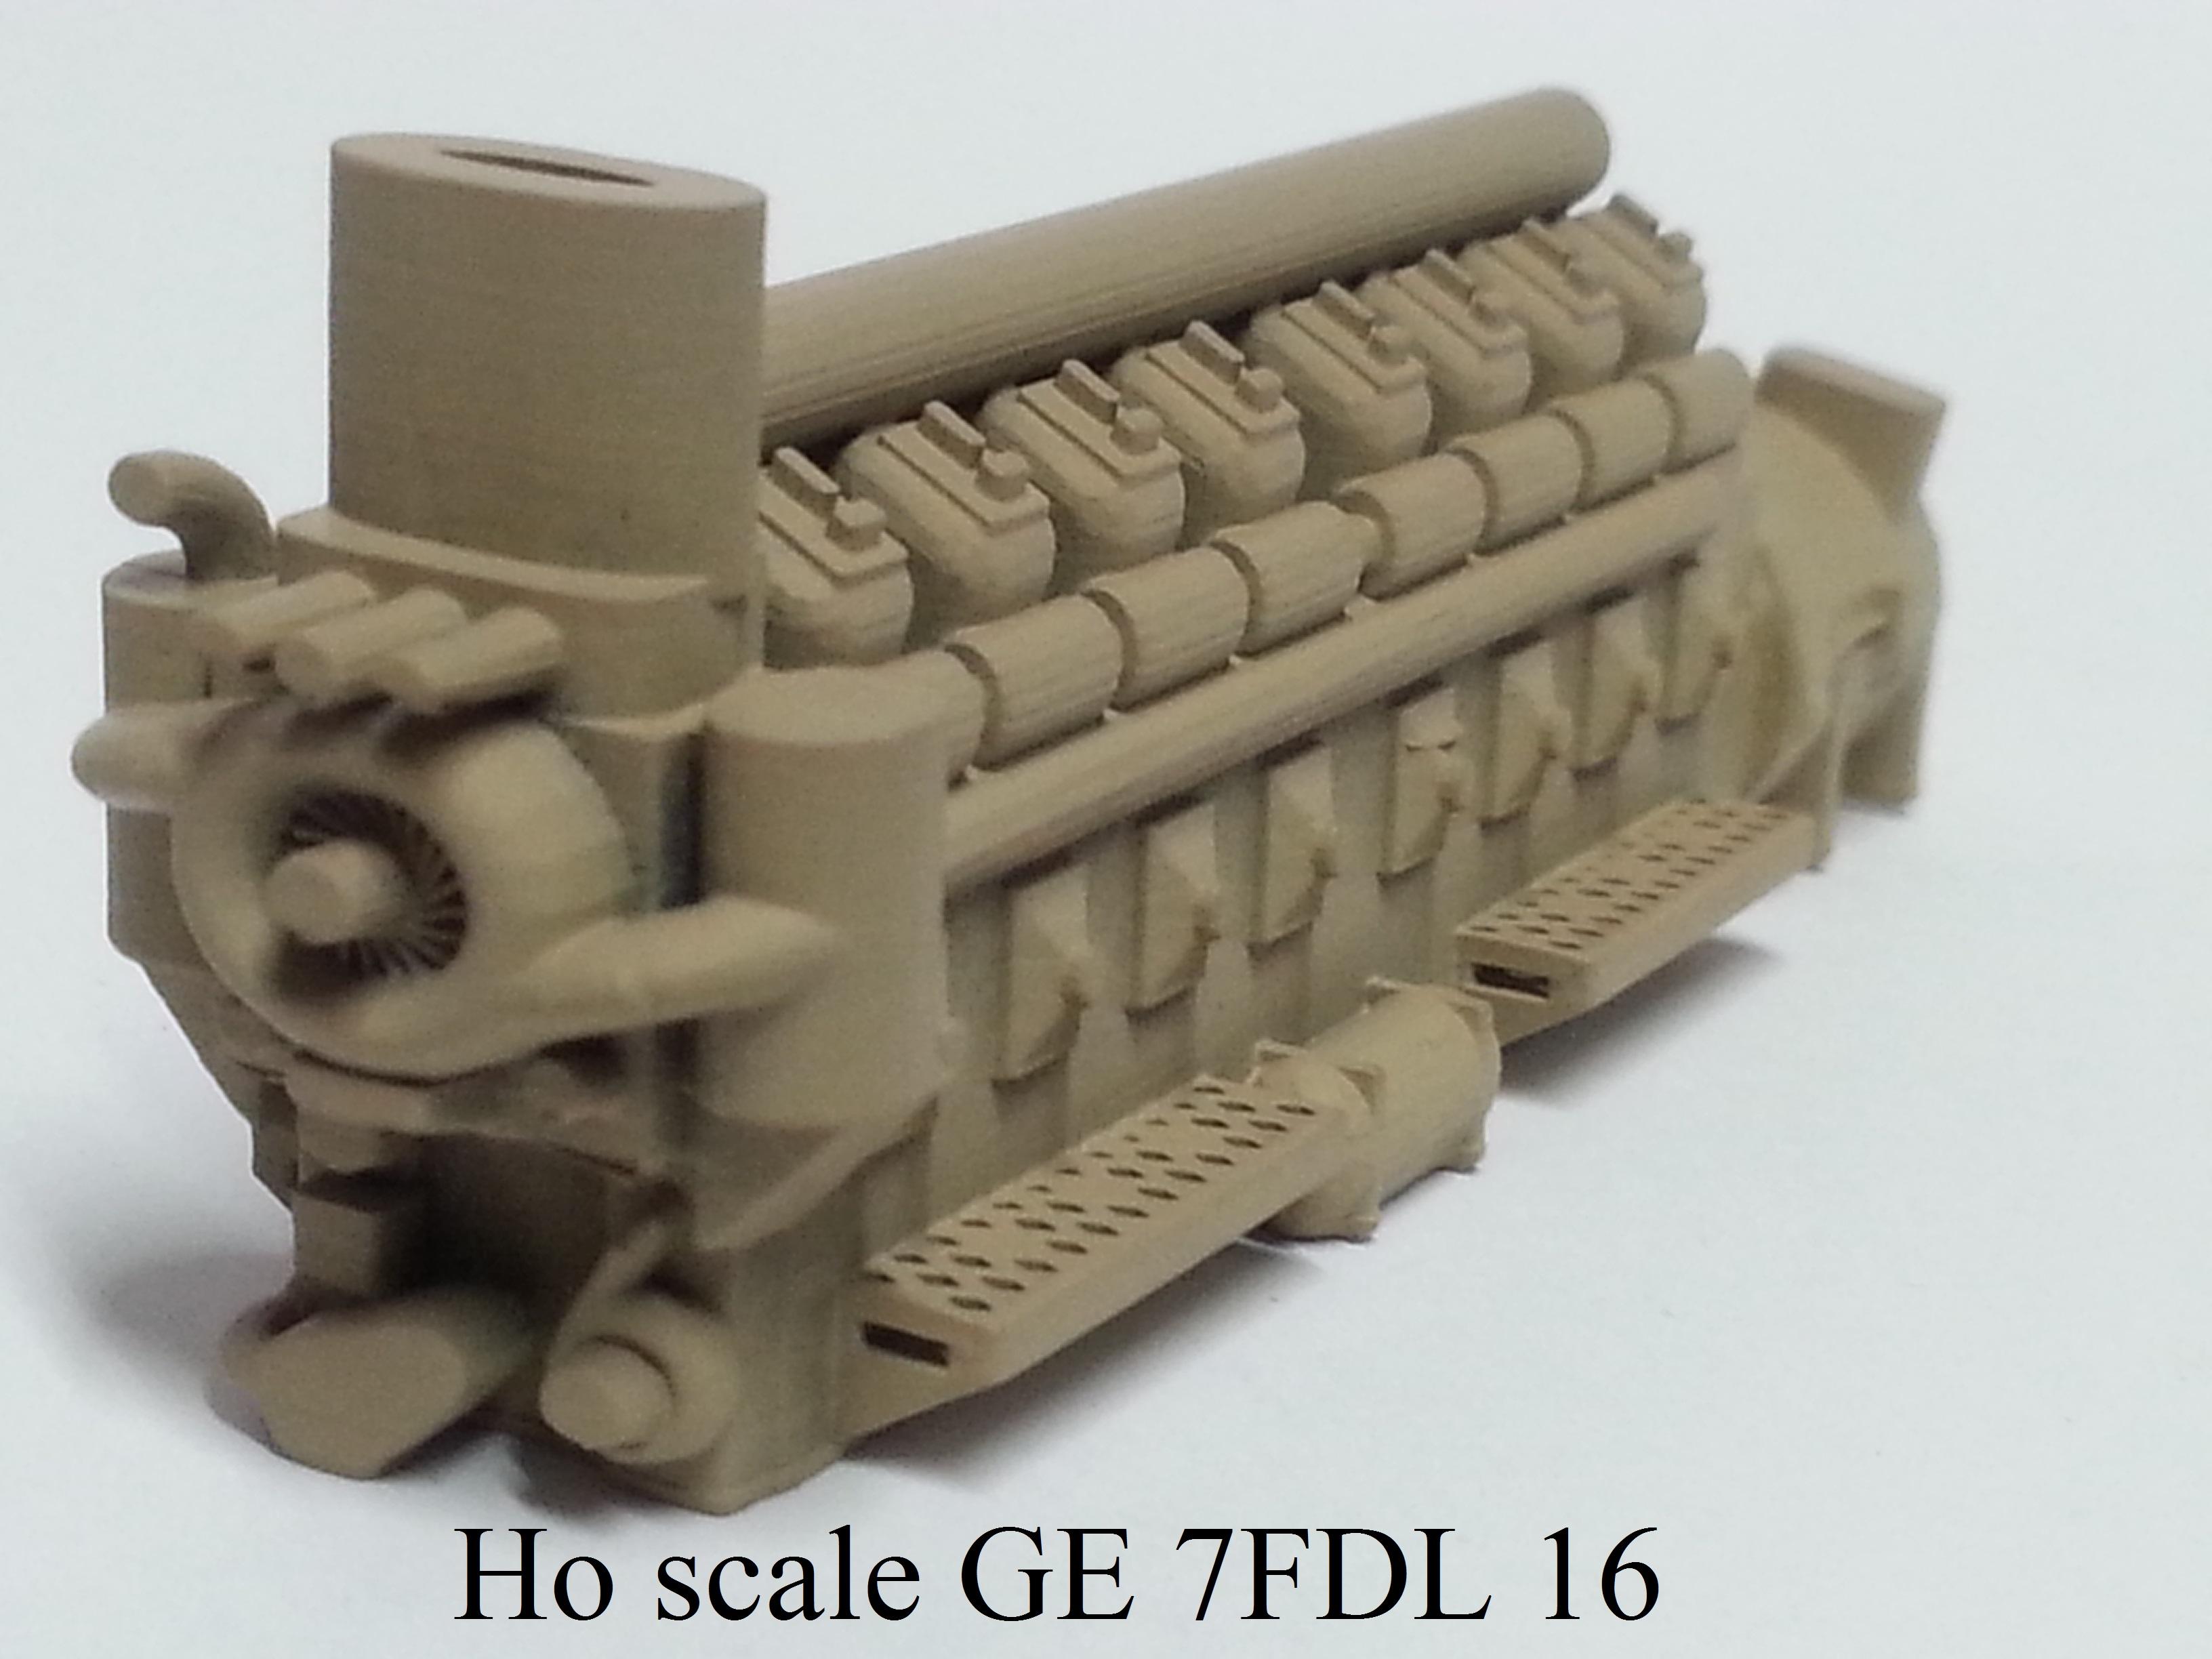 Ho scale GE 7FDL 16